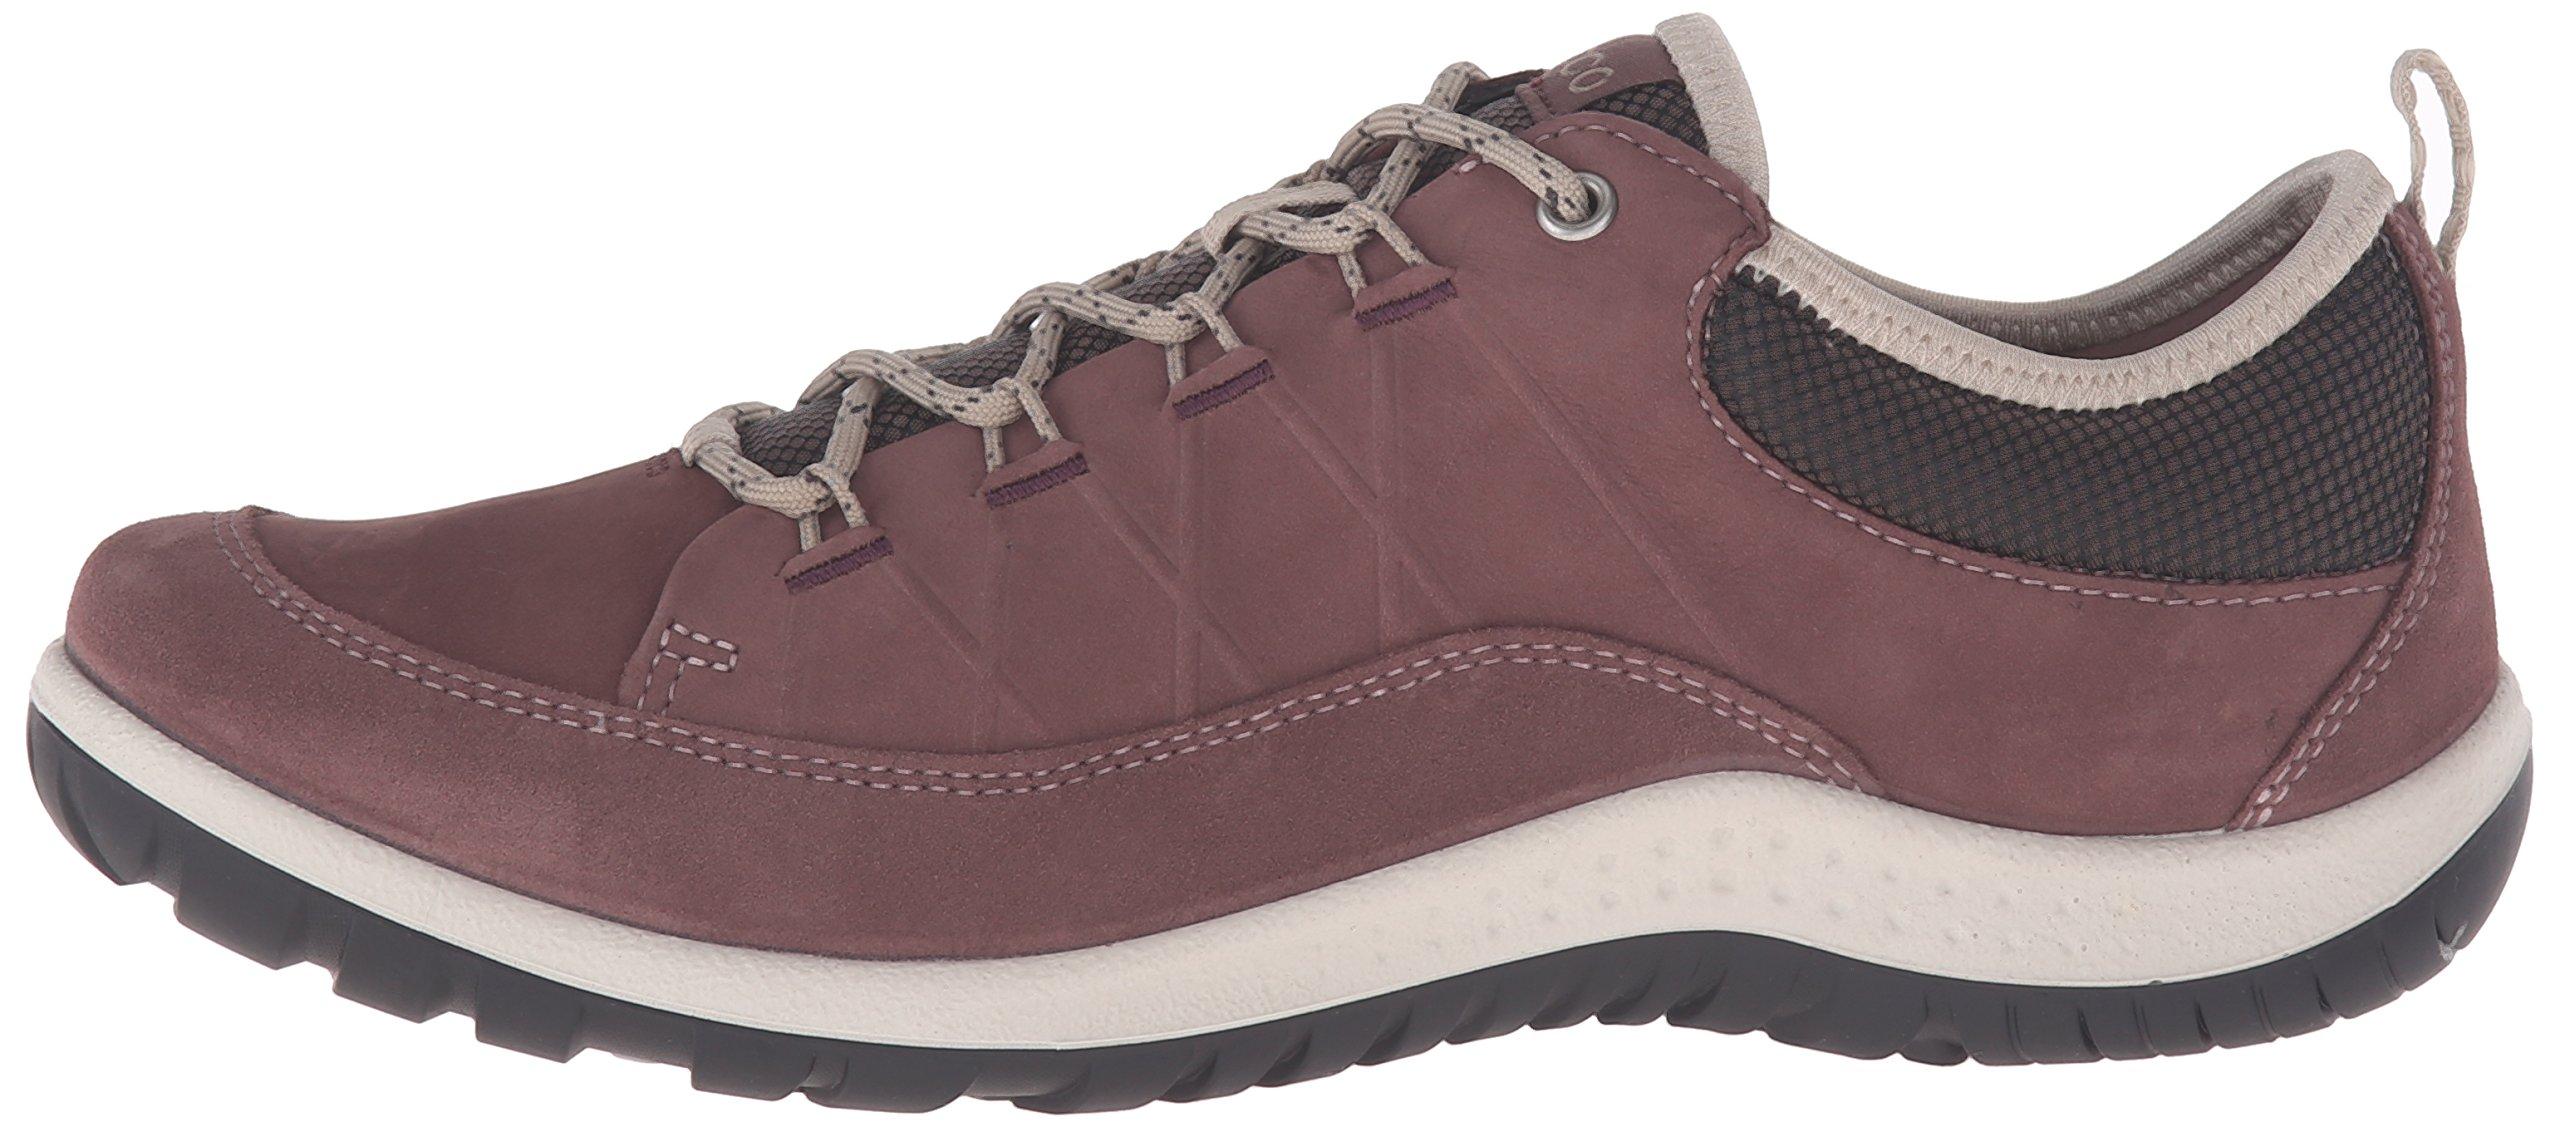 81JMau61S1L - ECCO Women's Aspina Multisport Outdoor Shoes